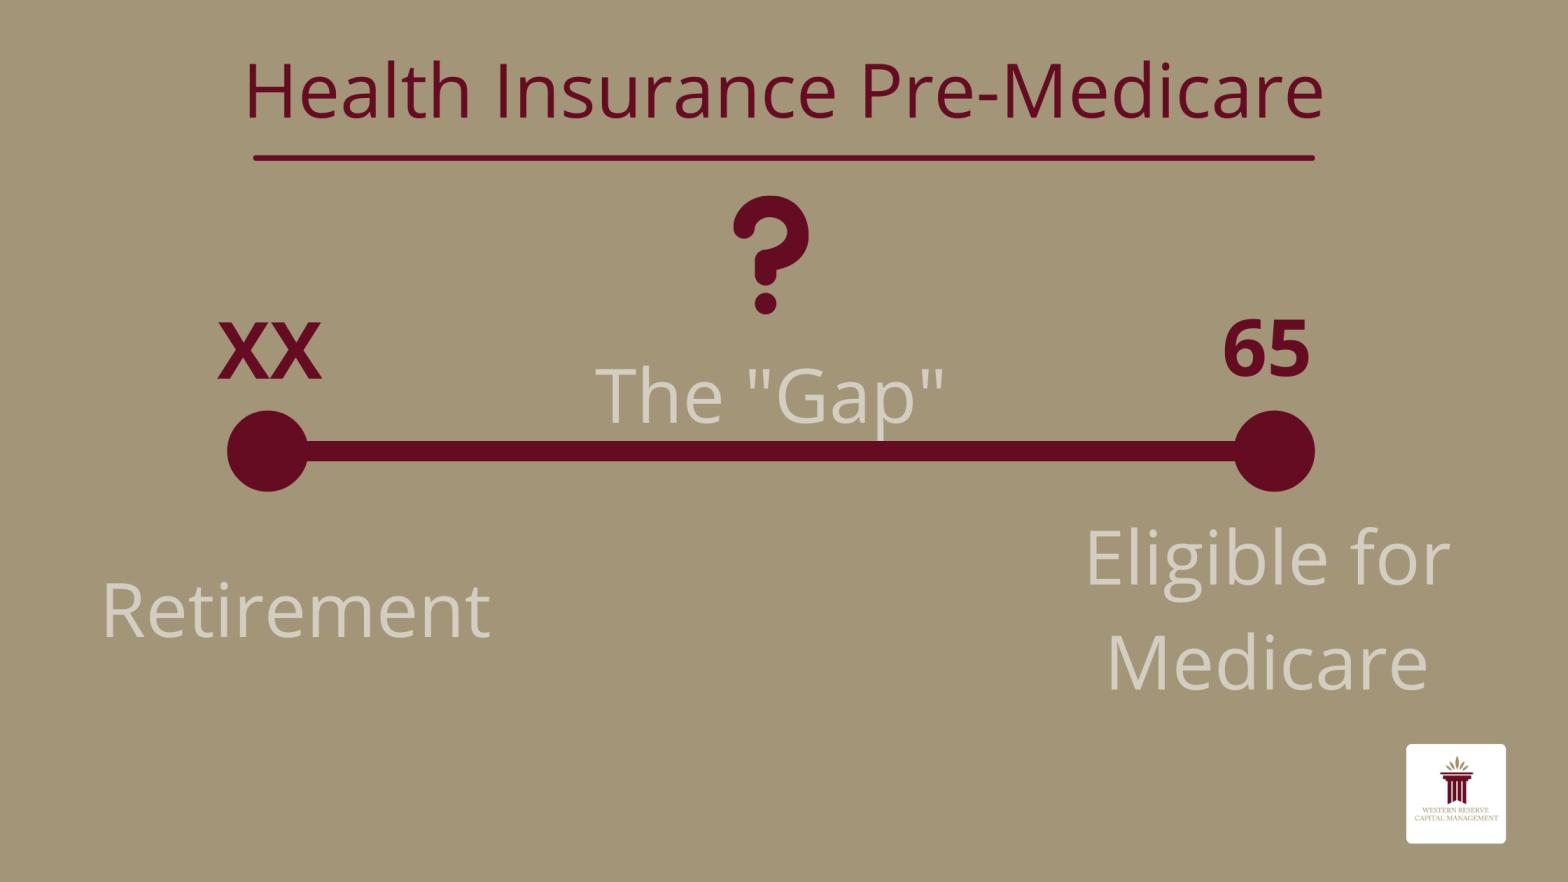 Health Insurance Pre-Medicare